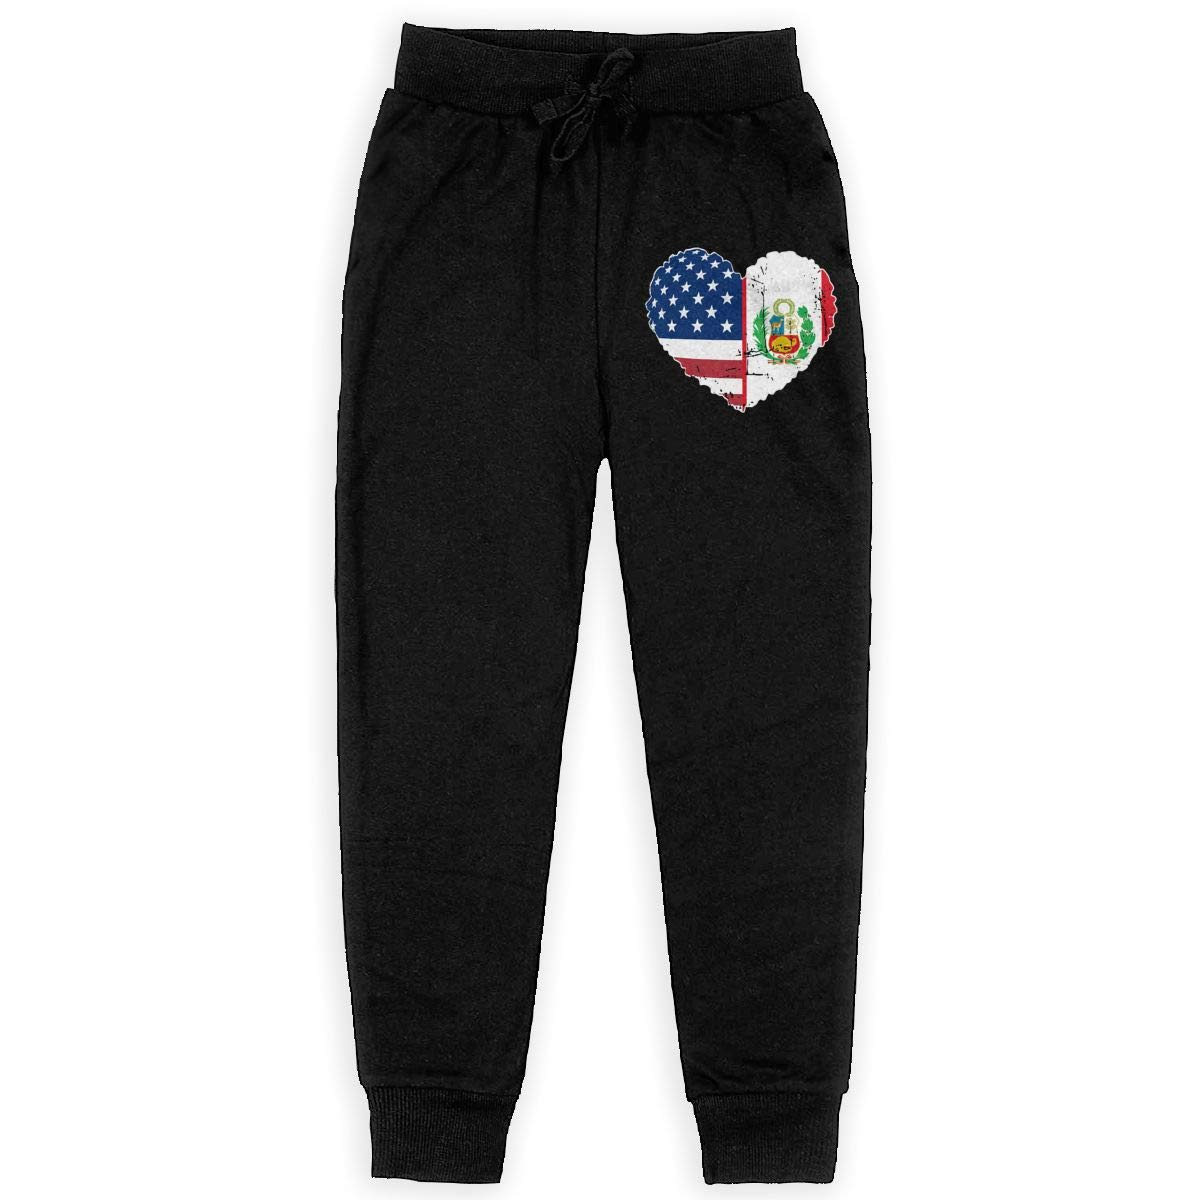 Youth Active Basic Jogger Fleece Pants for Teenager Boys WYZVK22 Peru USA Flag Heart Soft//Cozy Sweatpants